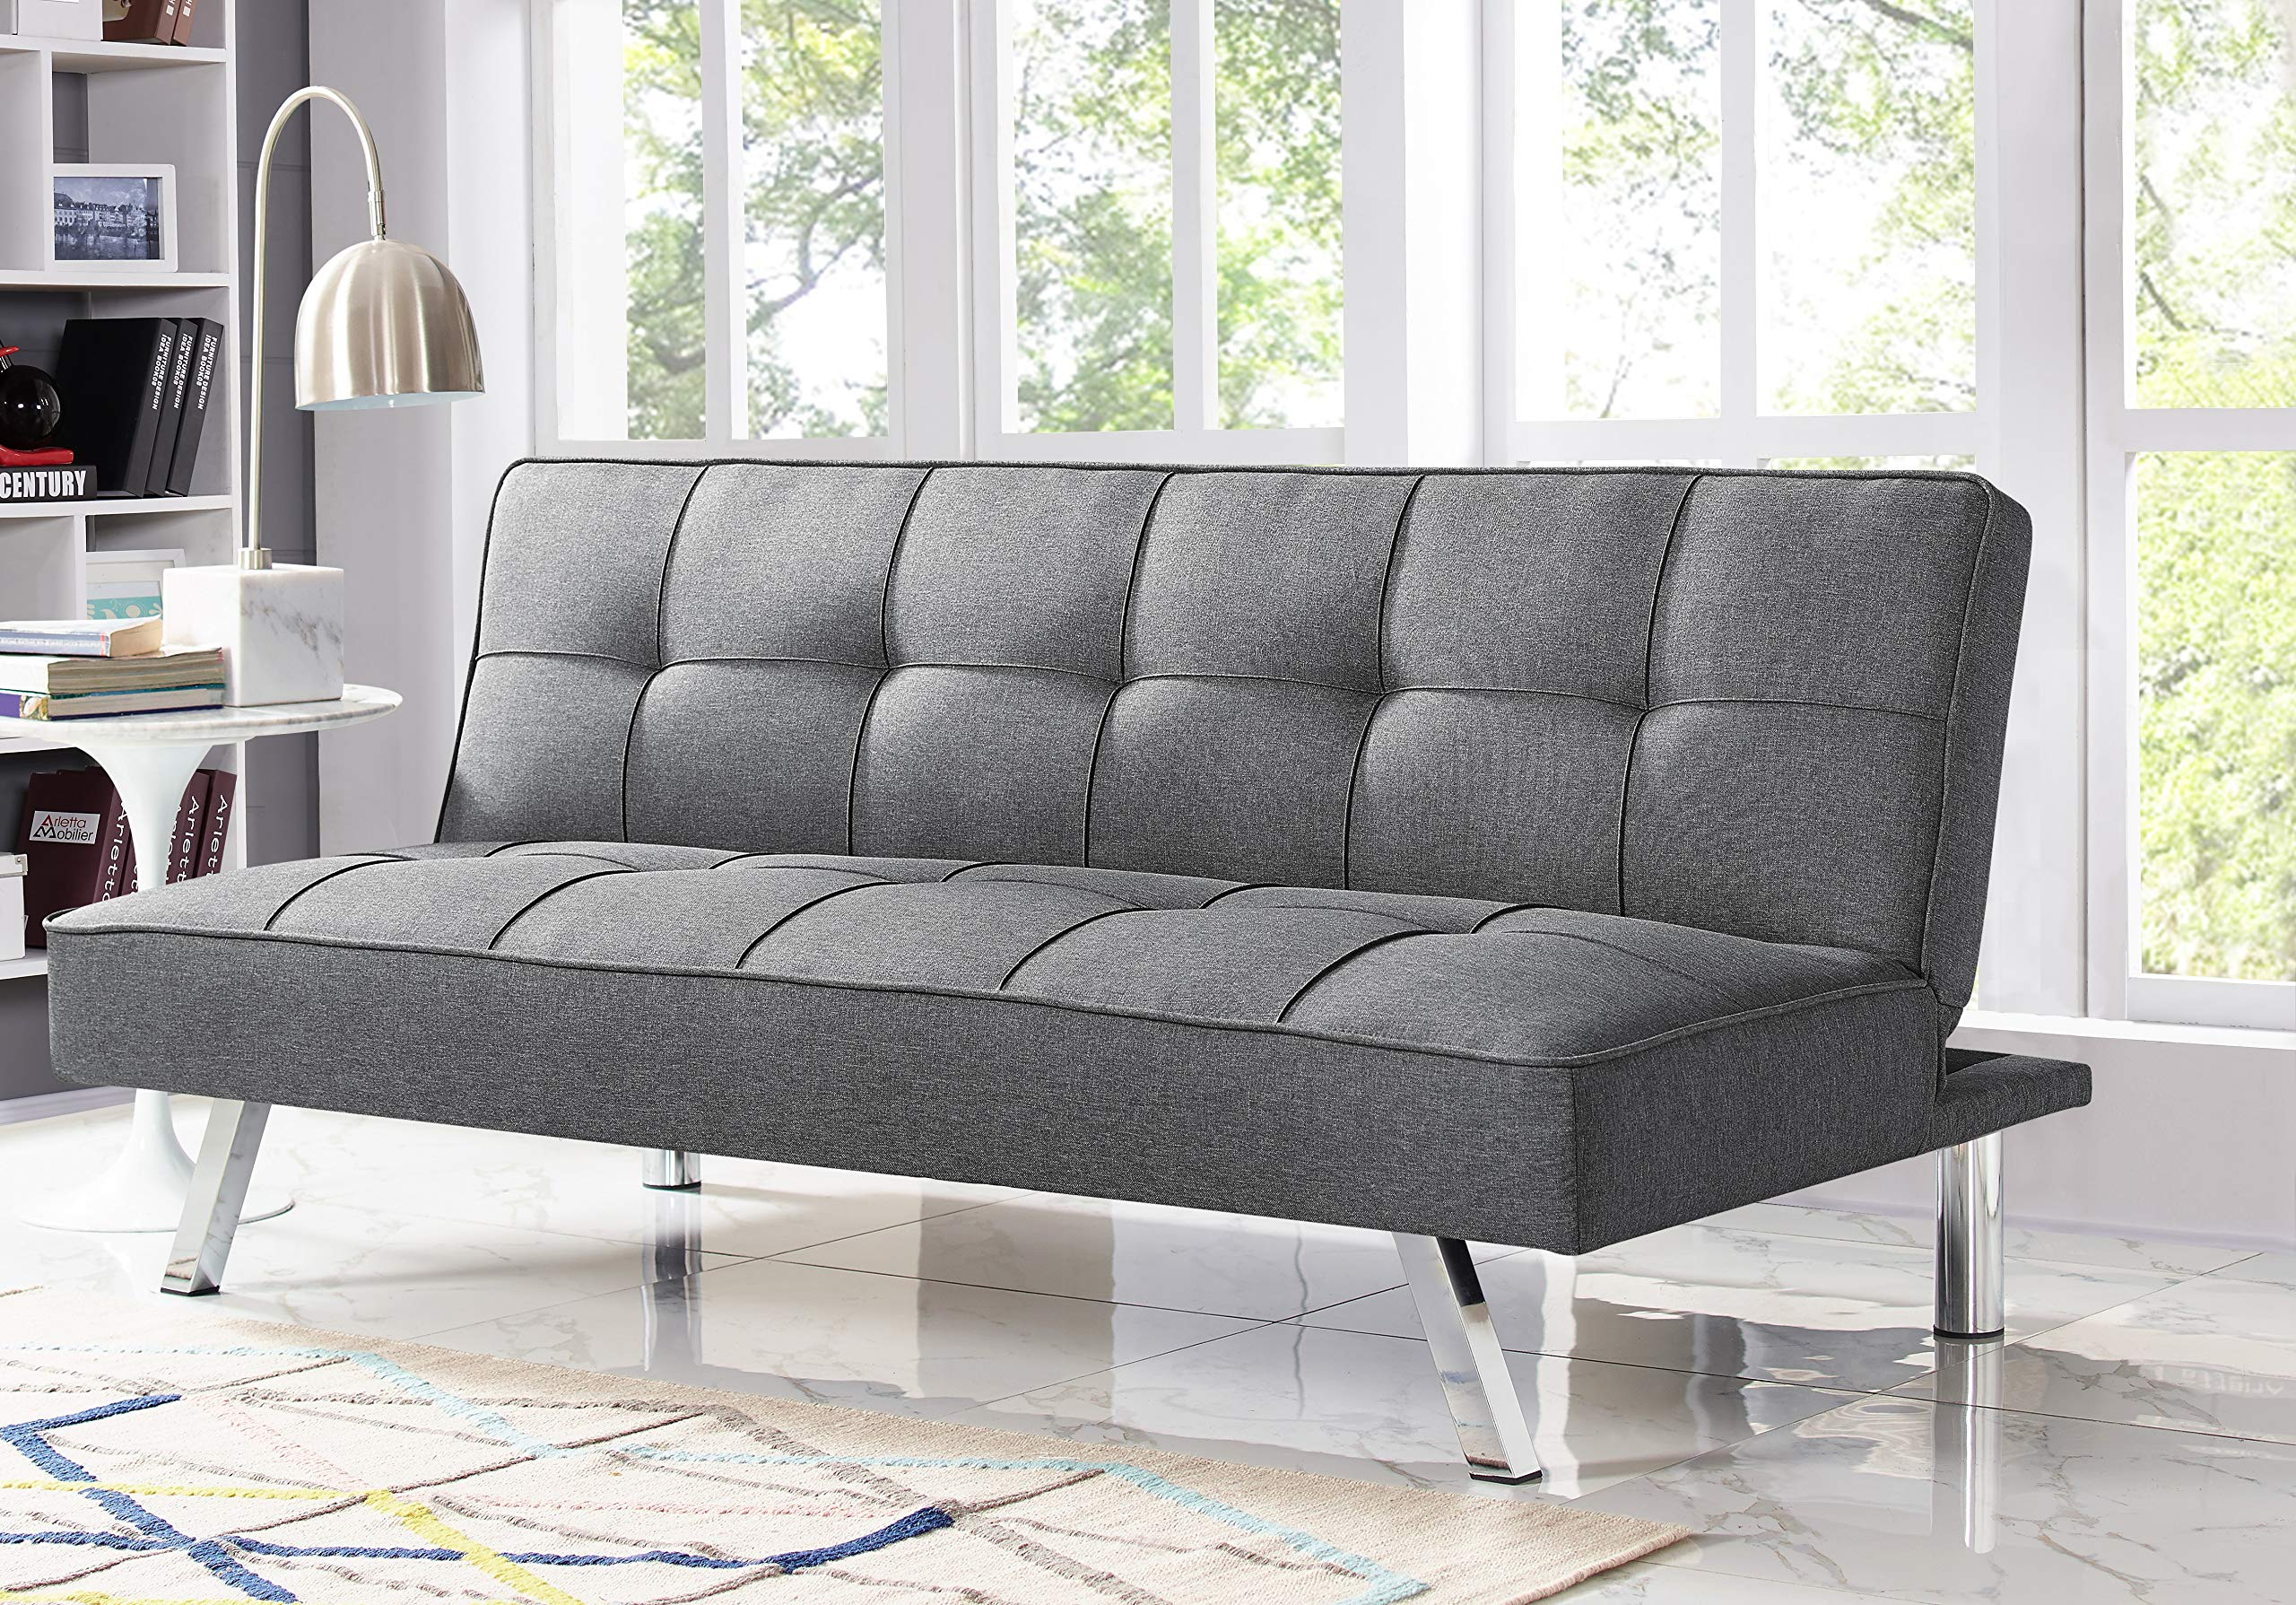 Serta RNE-3S-CC-SET Rane Collection Convertible Sofa, L66.1 x W33.1 x H29.5, Charcoal by Serta